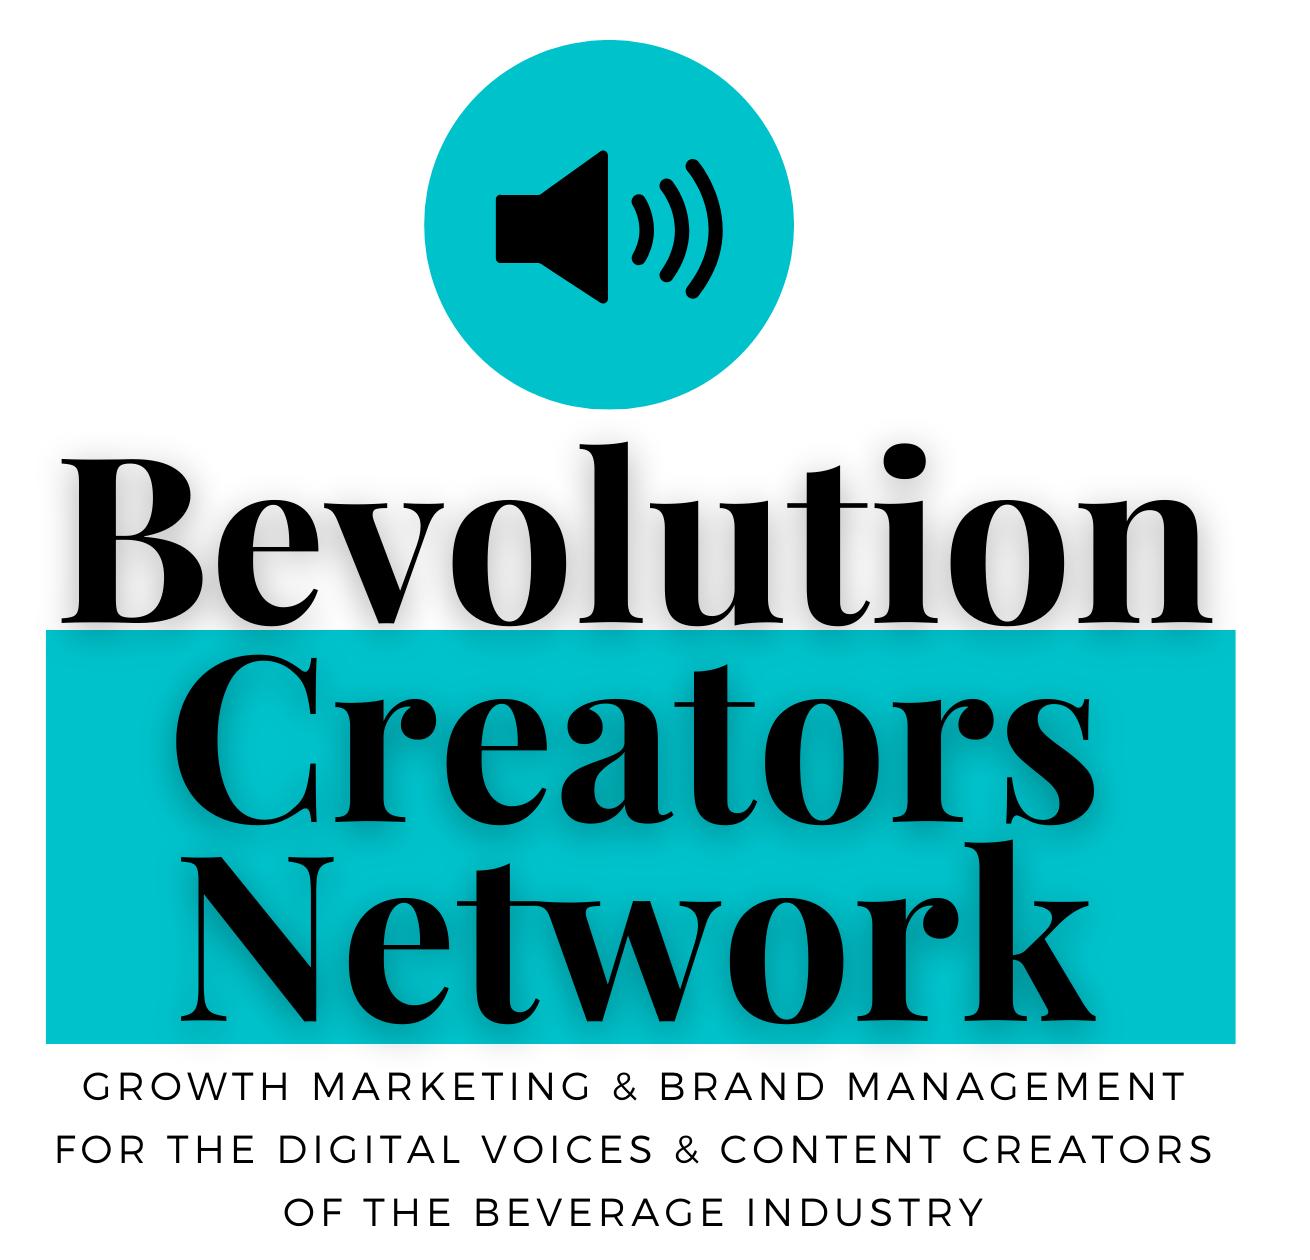 Bevolution Creators Network